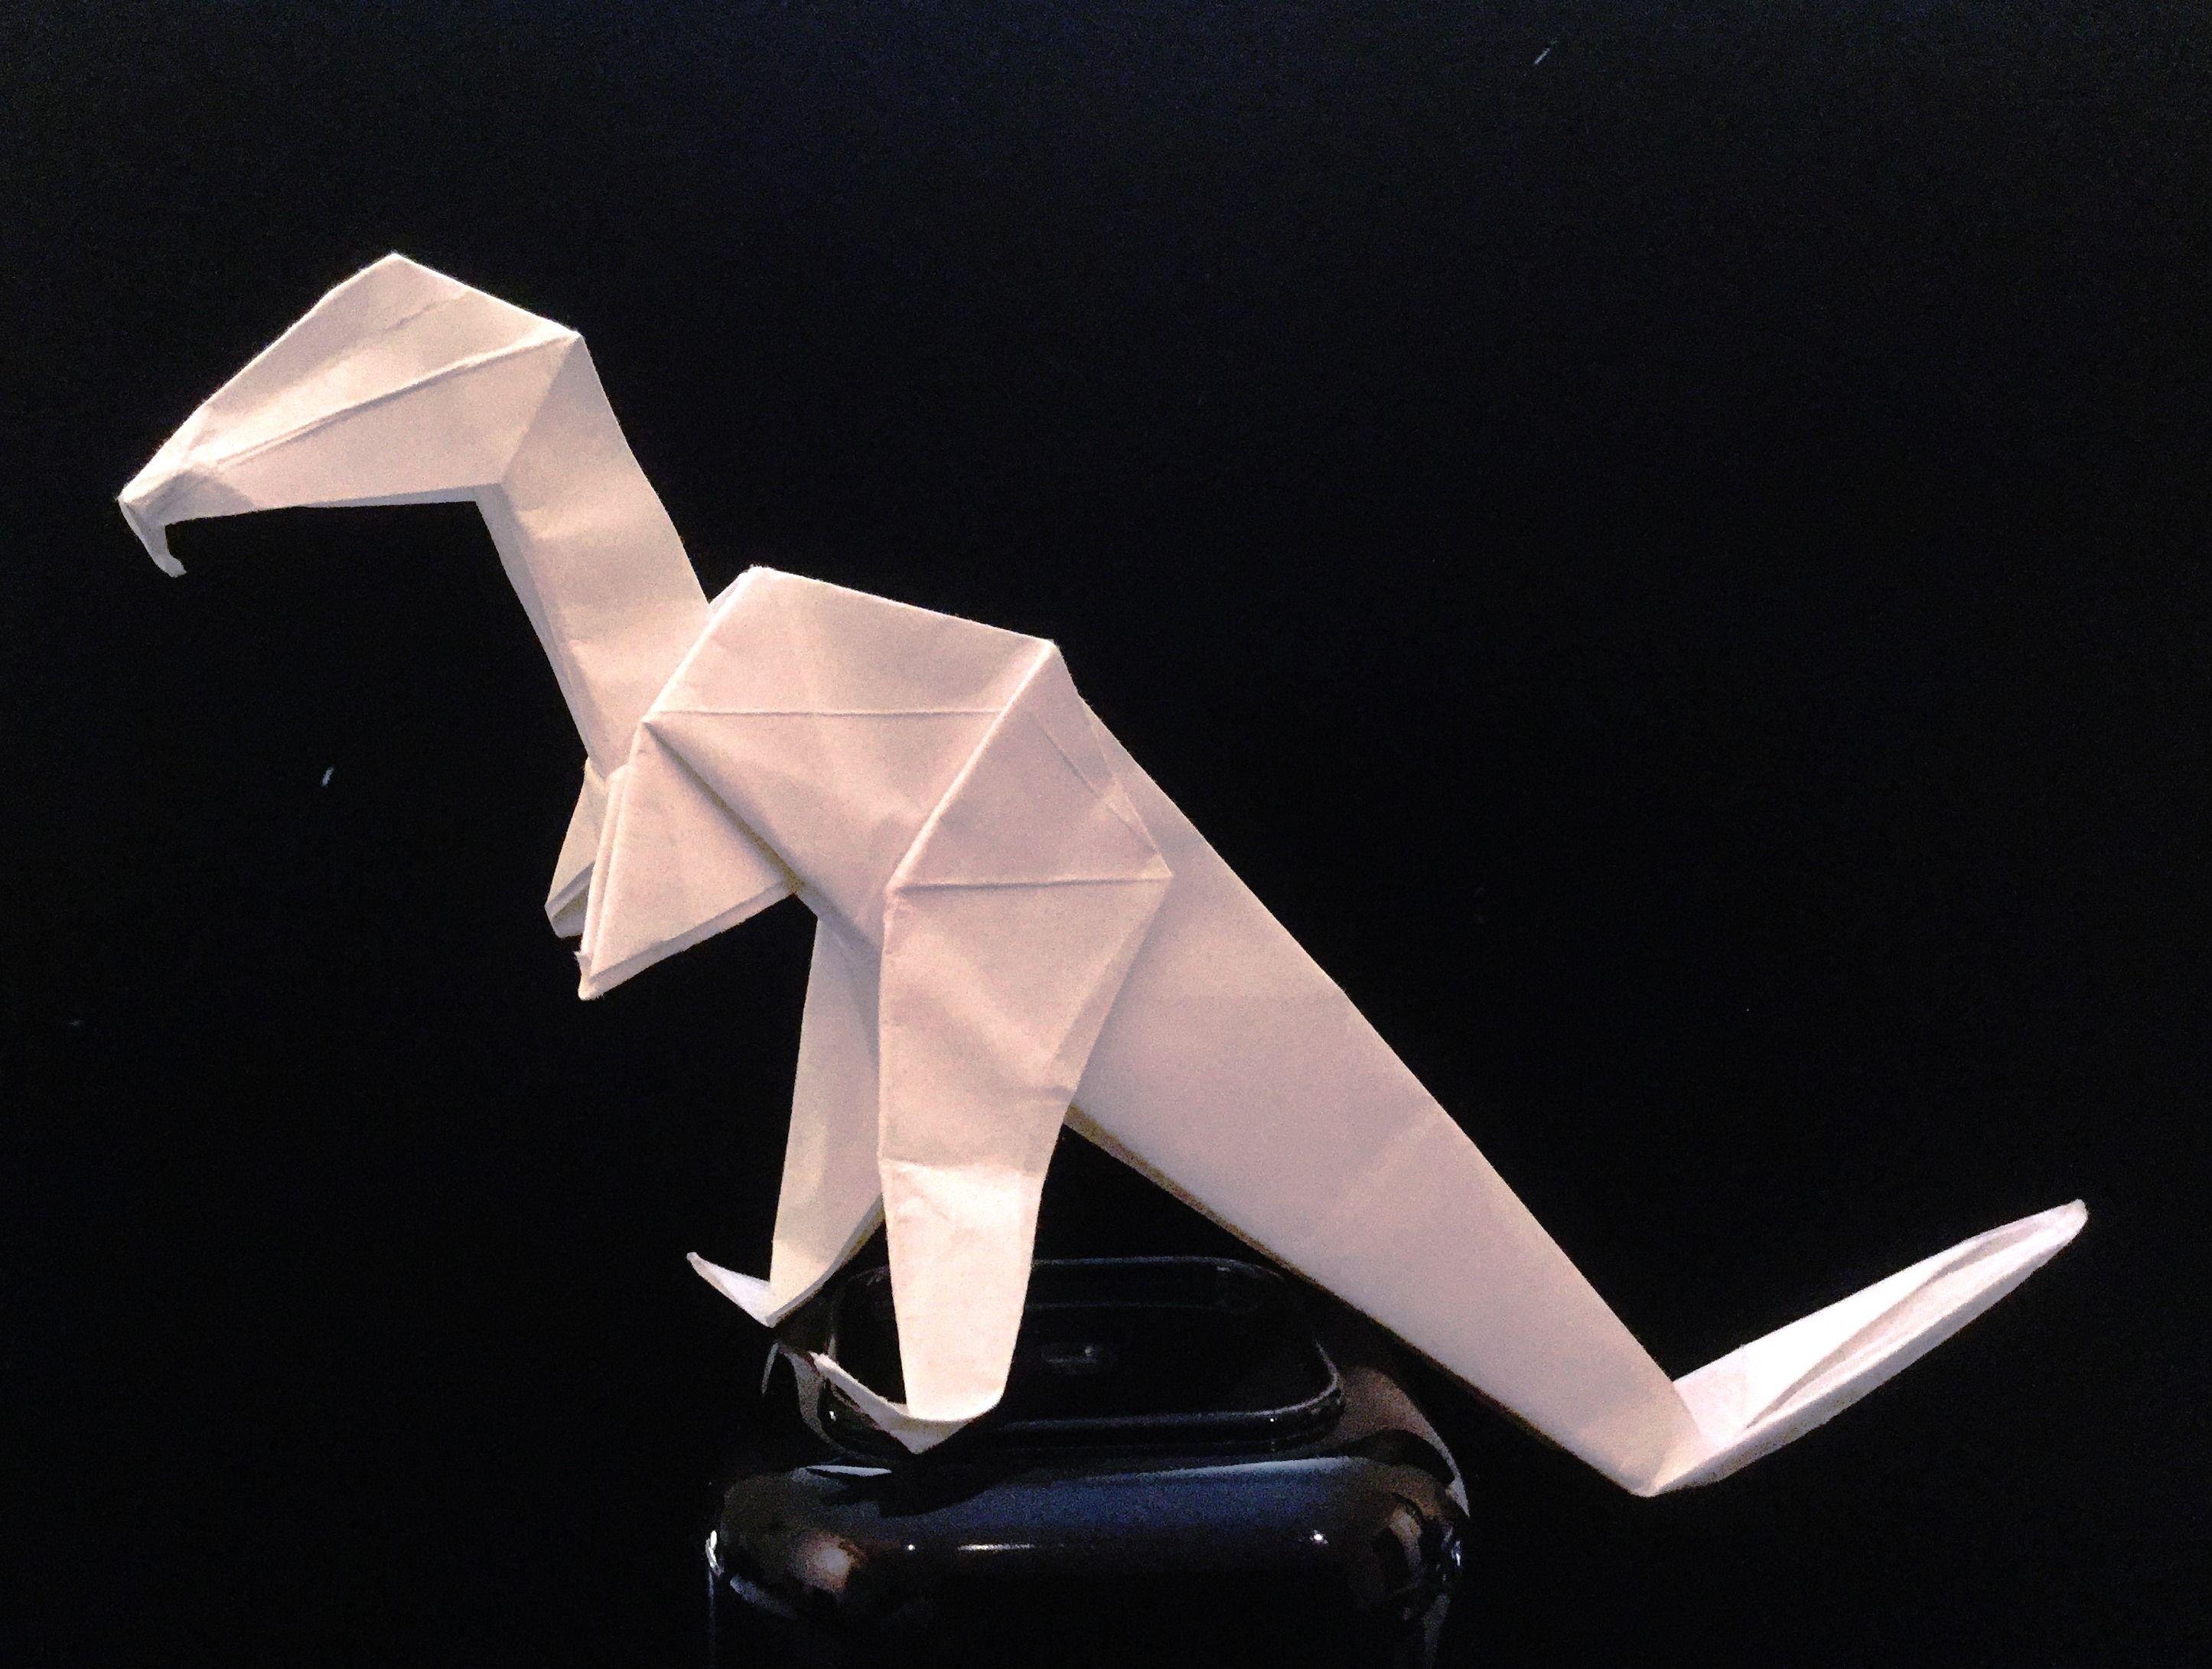 Dinosaurio origami pinterest origami origami jeuxipadfo Image collections